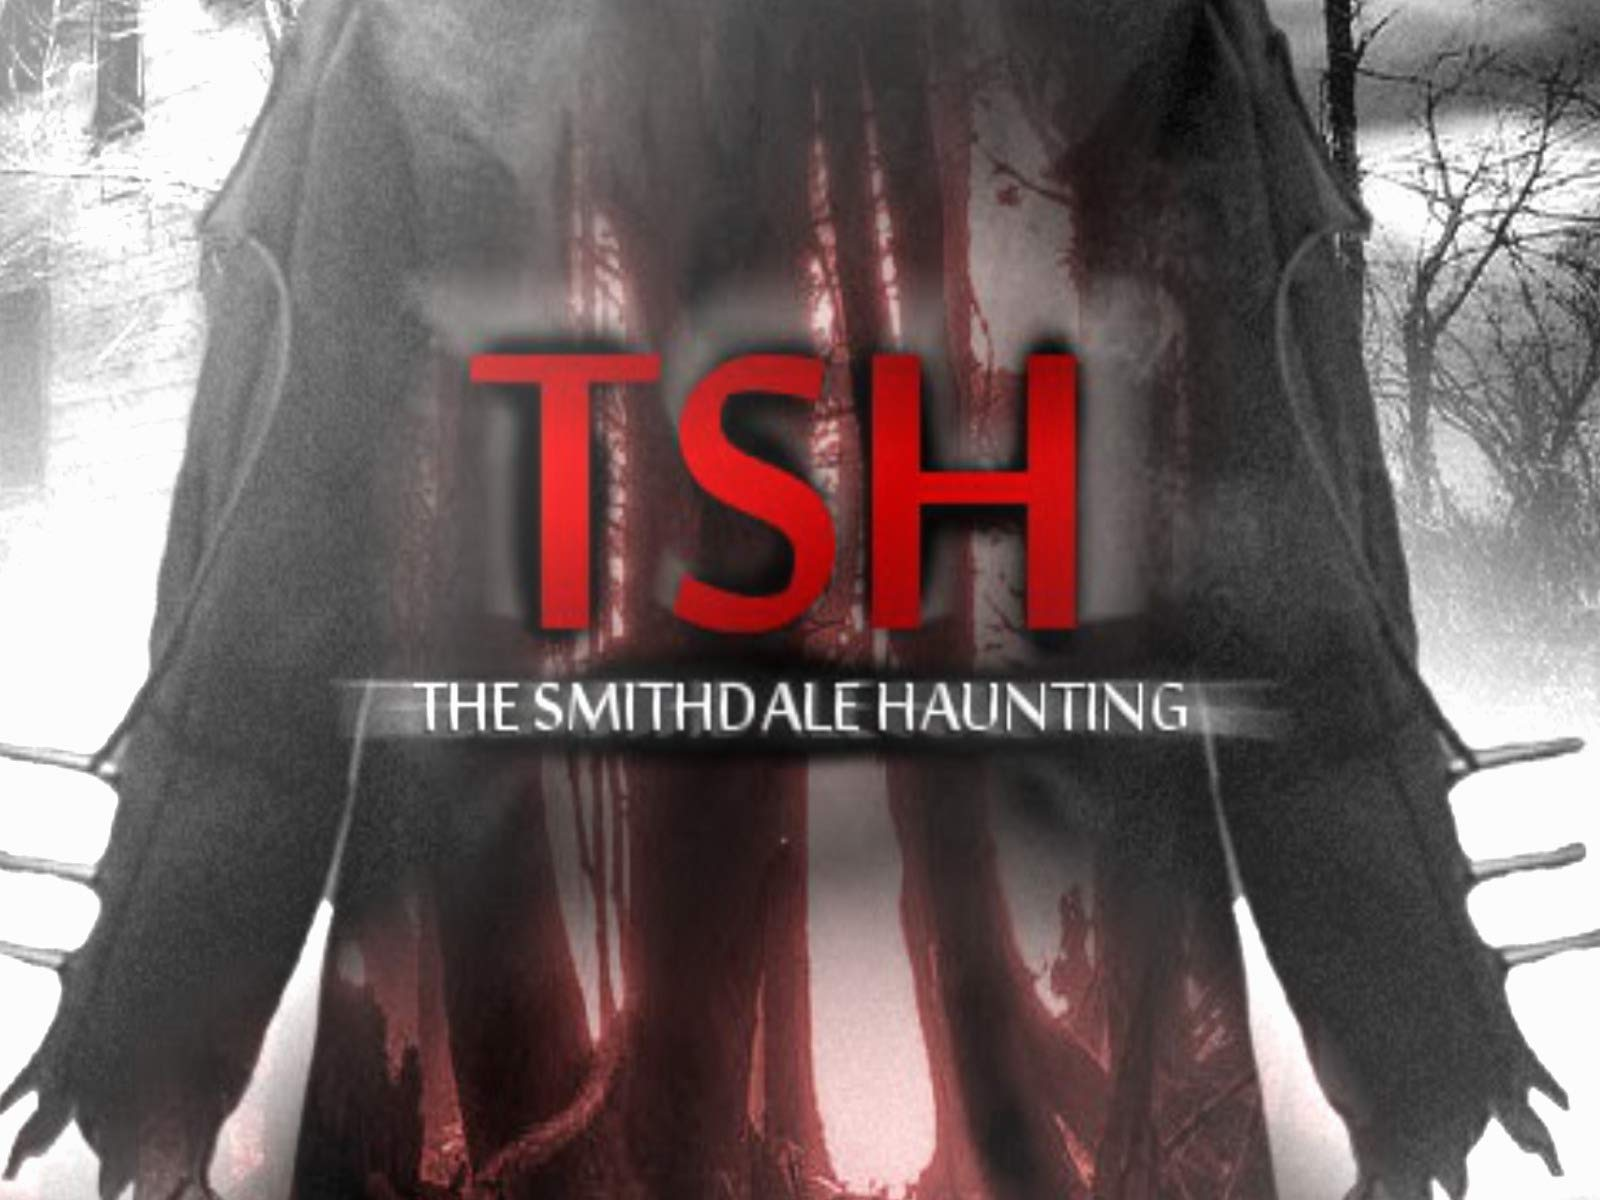 The Smithdale Haunting